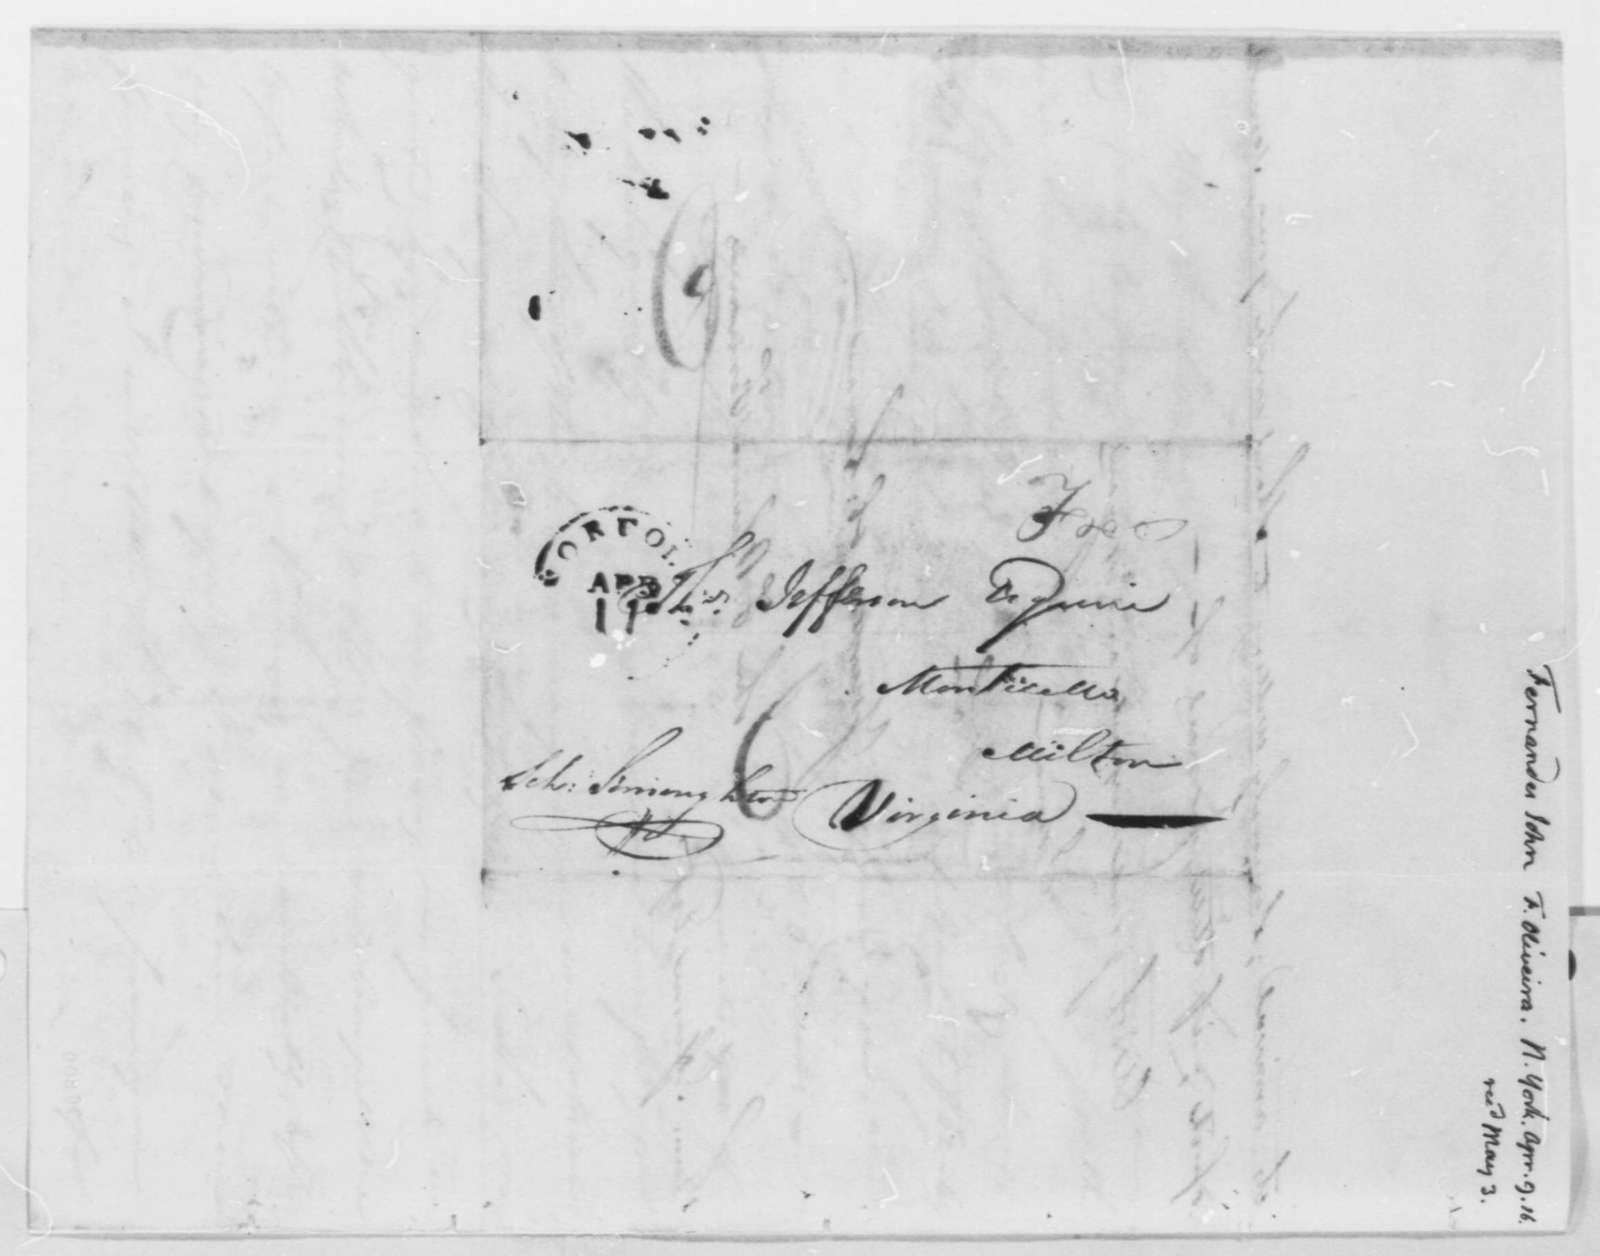 Fernandez Oliviera to Thomas Jefferson, April 9, 1816